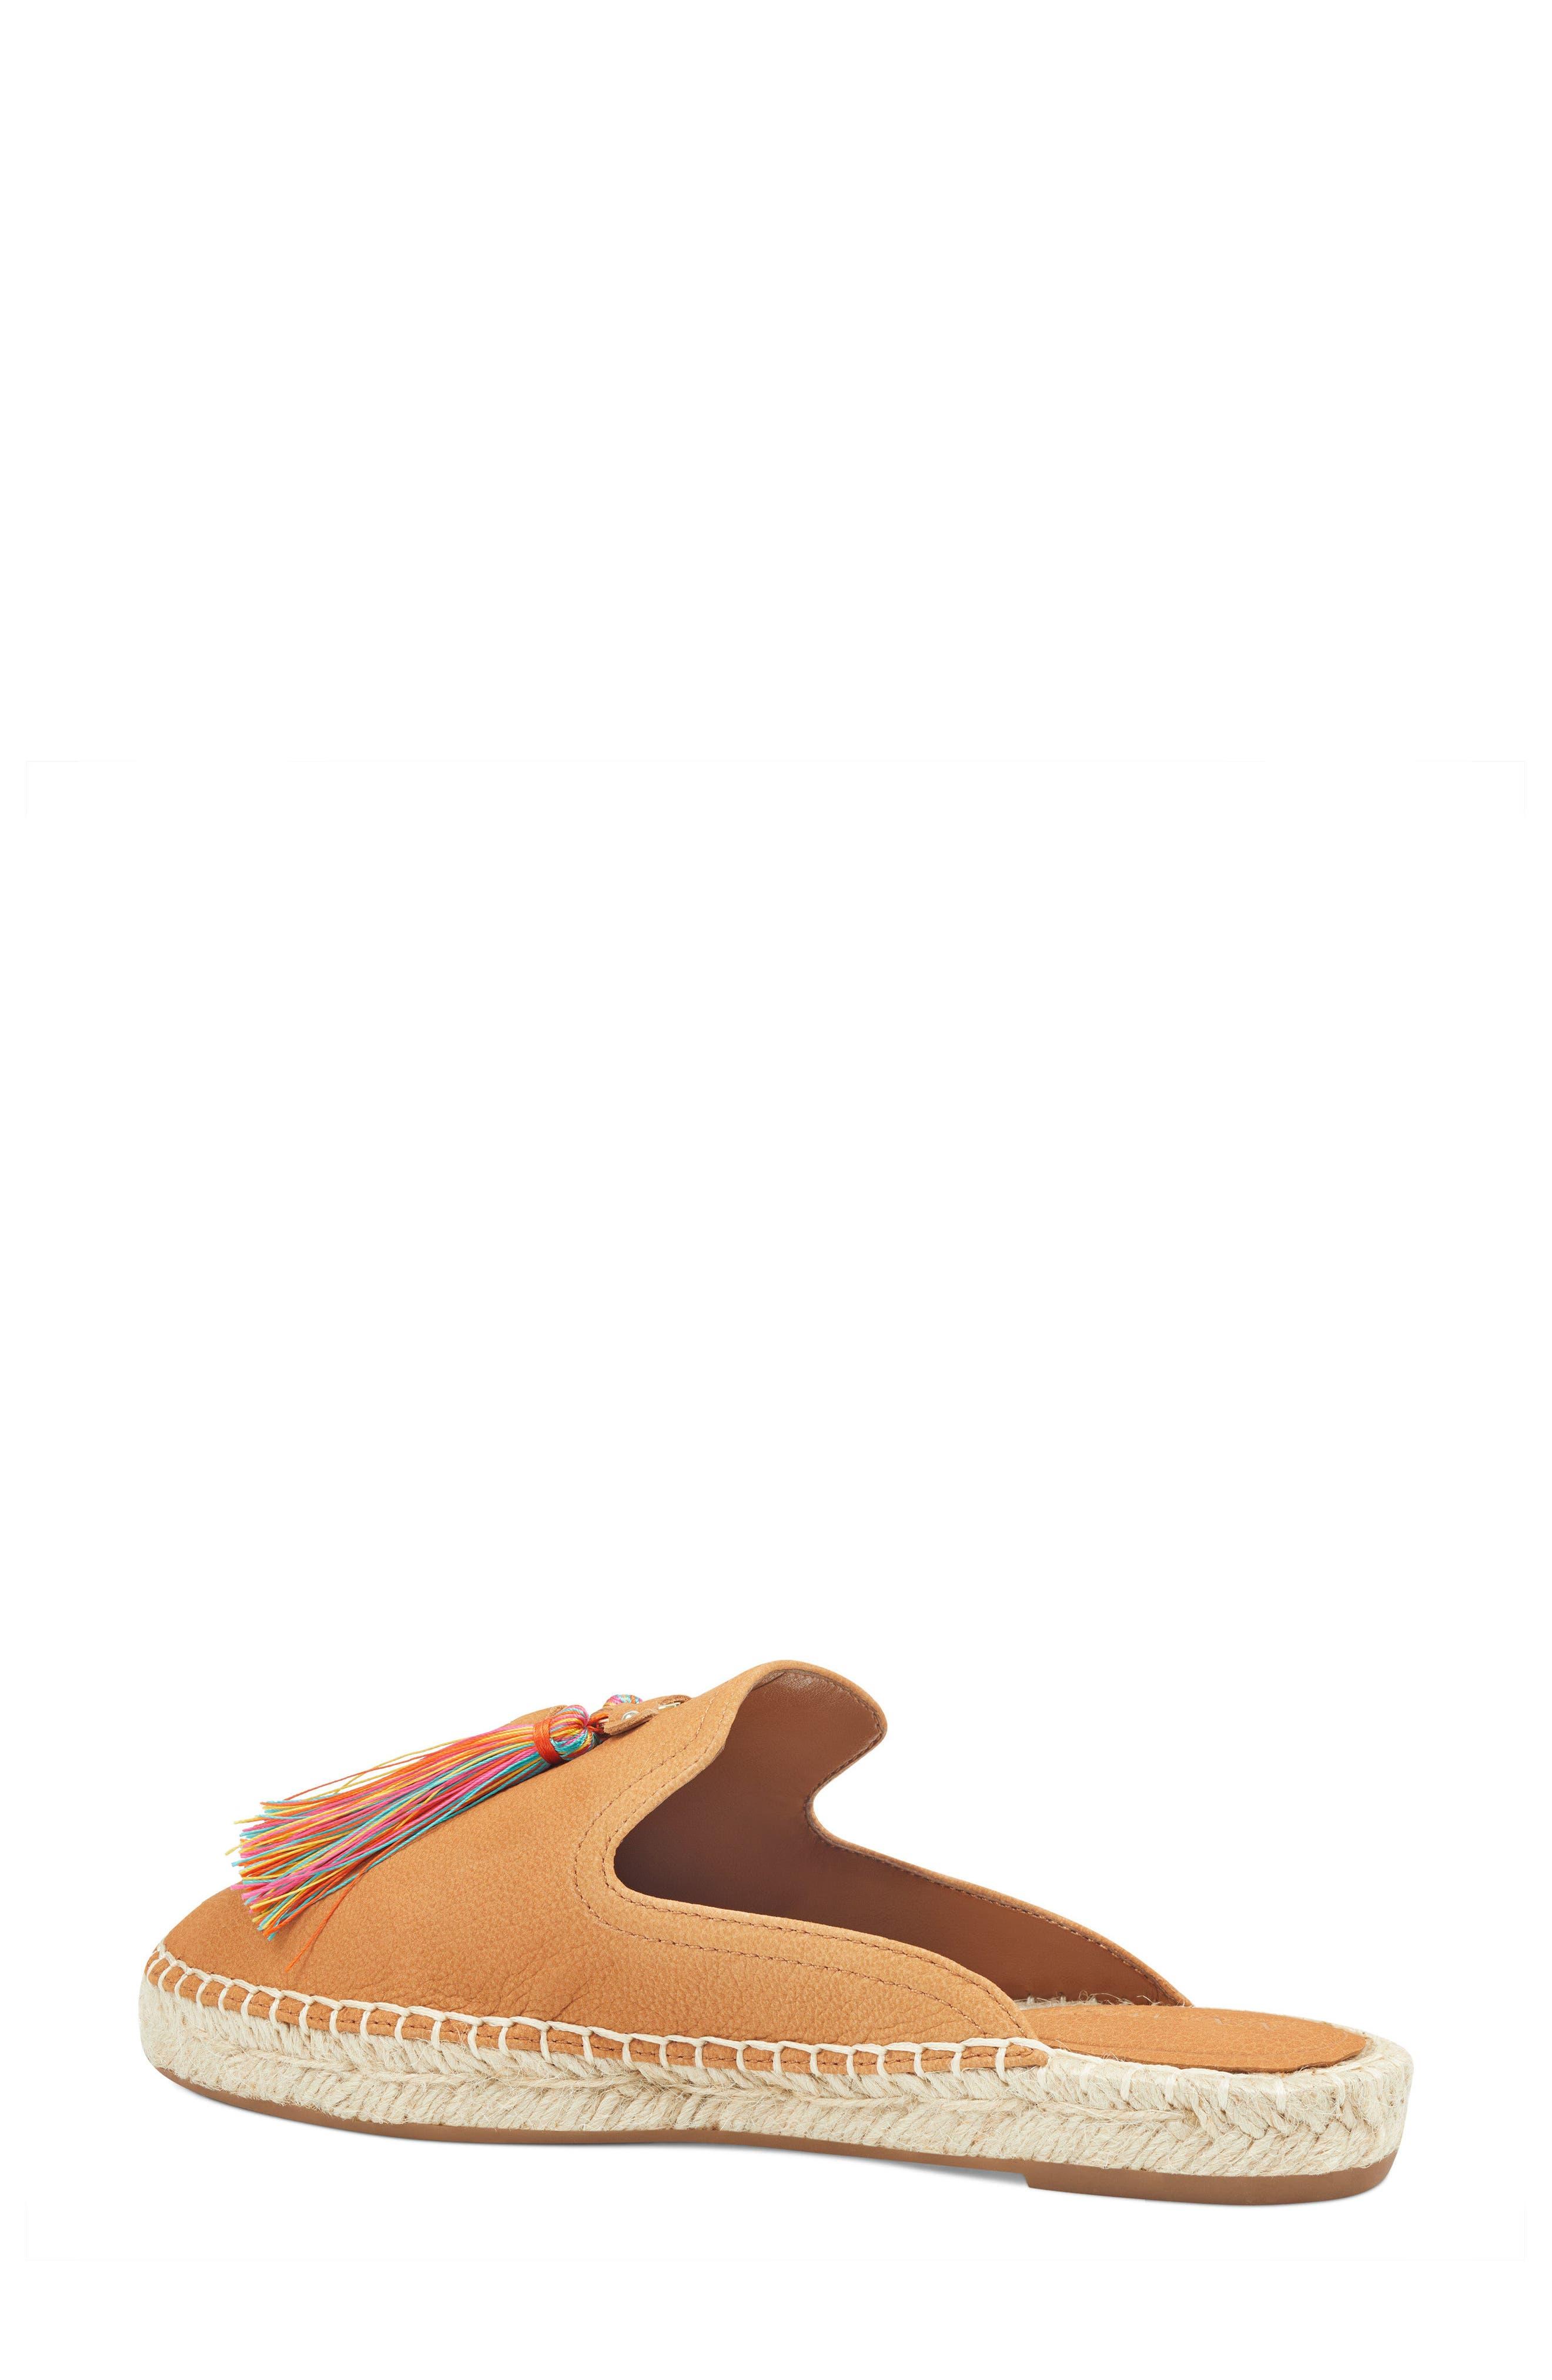 Val Tasseled Loafer Mule,                             Alternate thumbnail 2, color,                             Dark Natural Suede